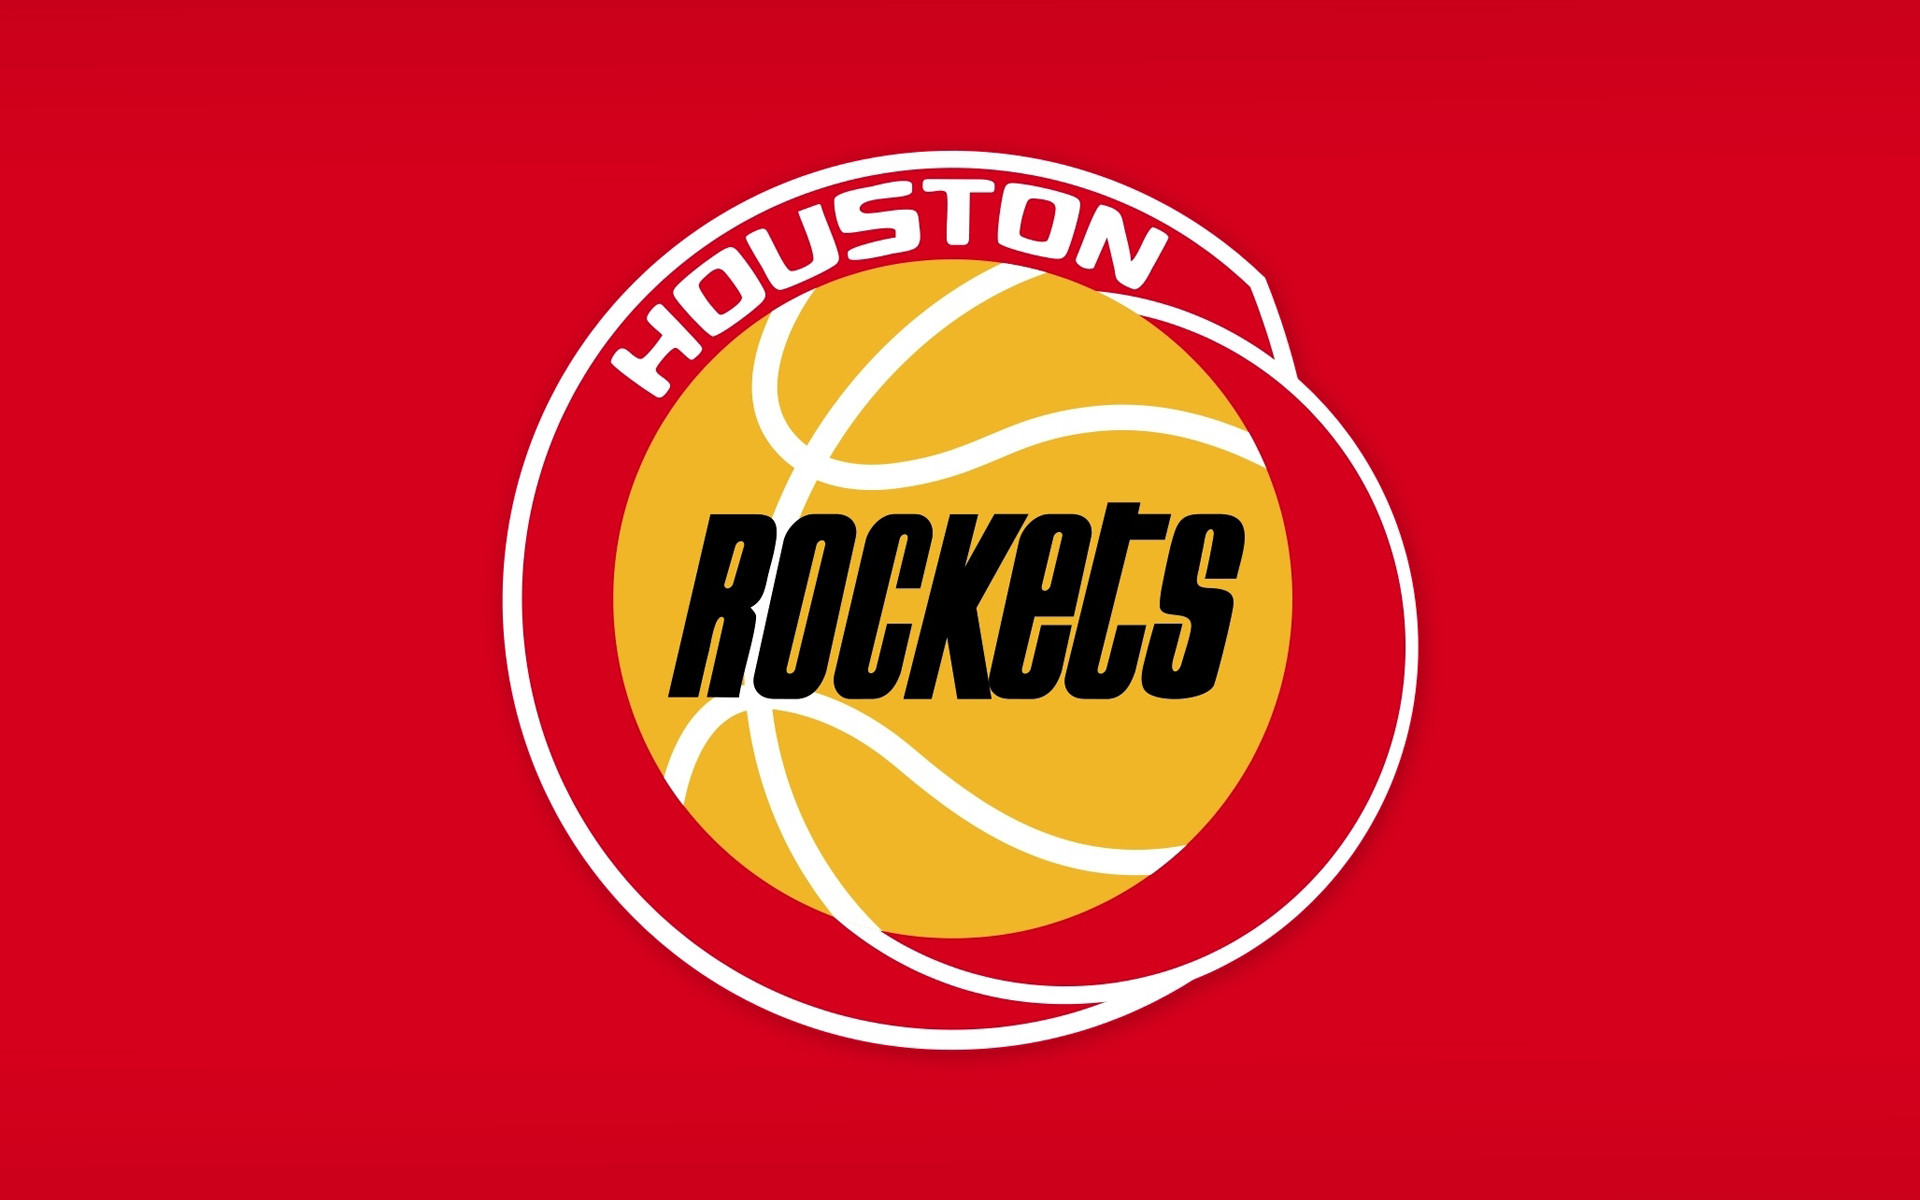 HOUSTON ROCKETS basketball nba (69) wallpaper     211301    WallpaperUP